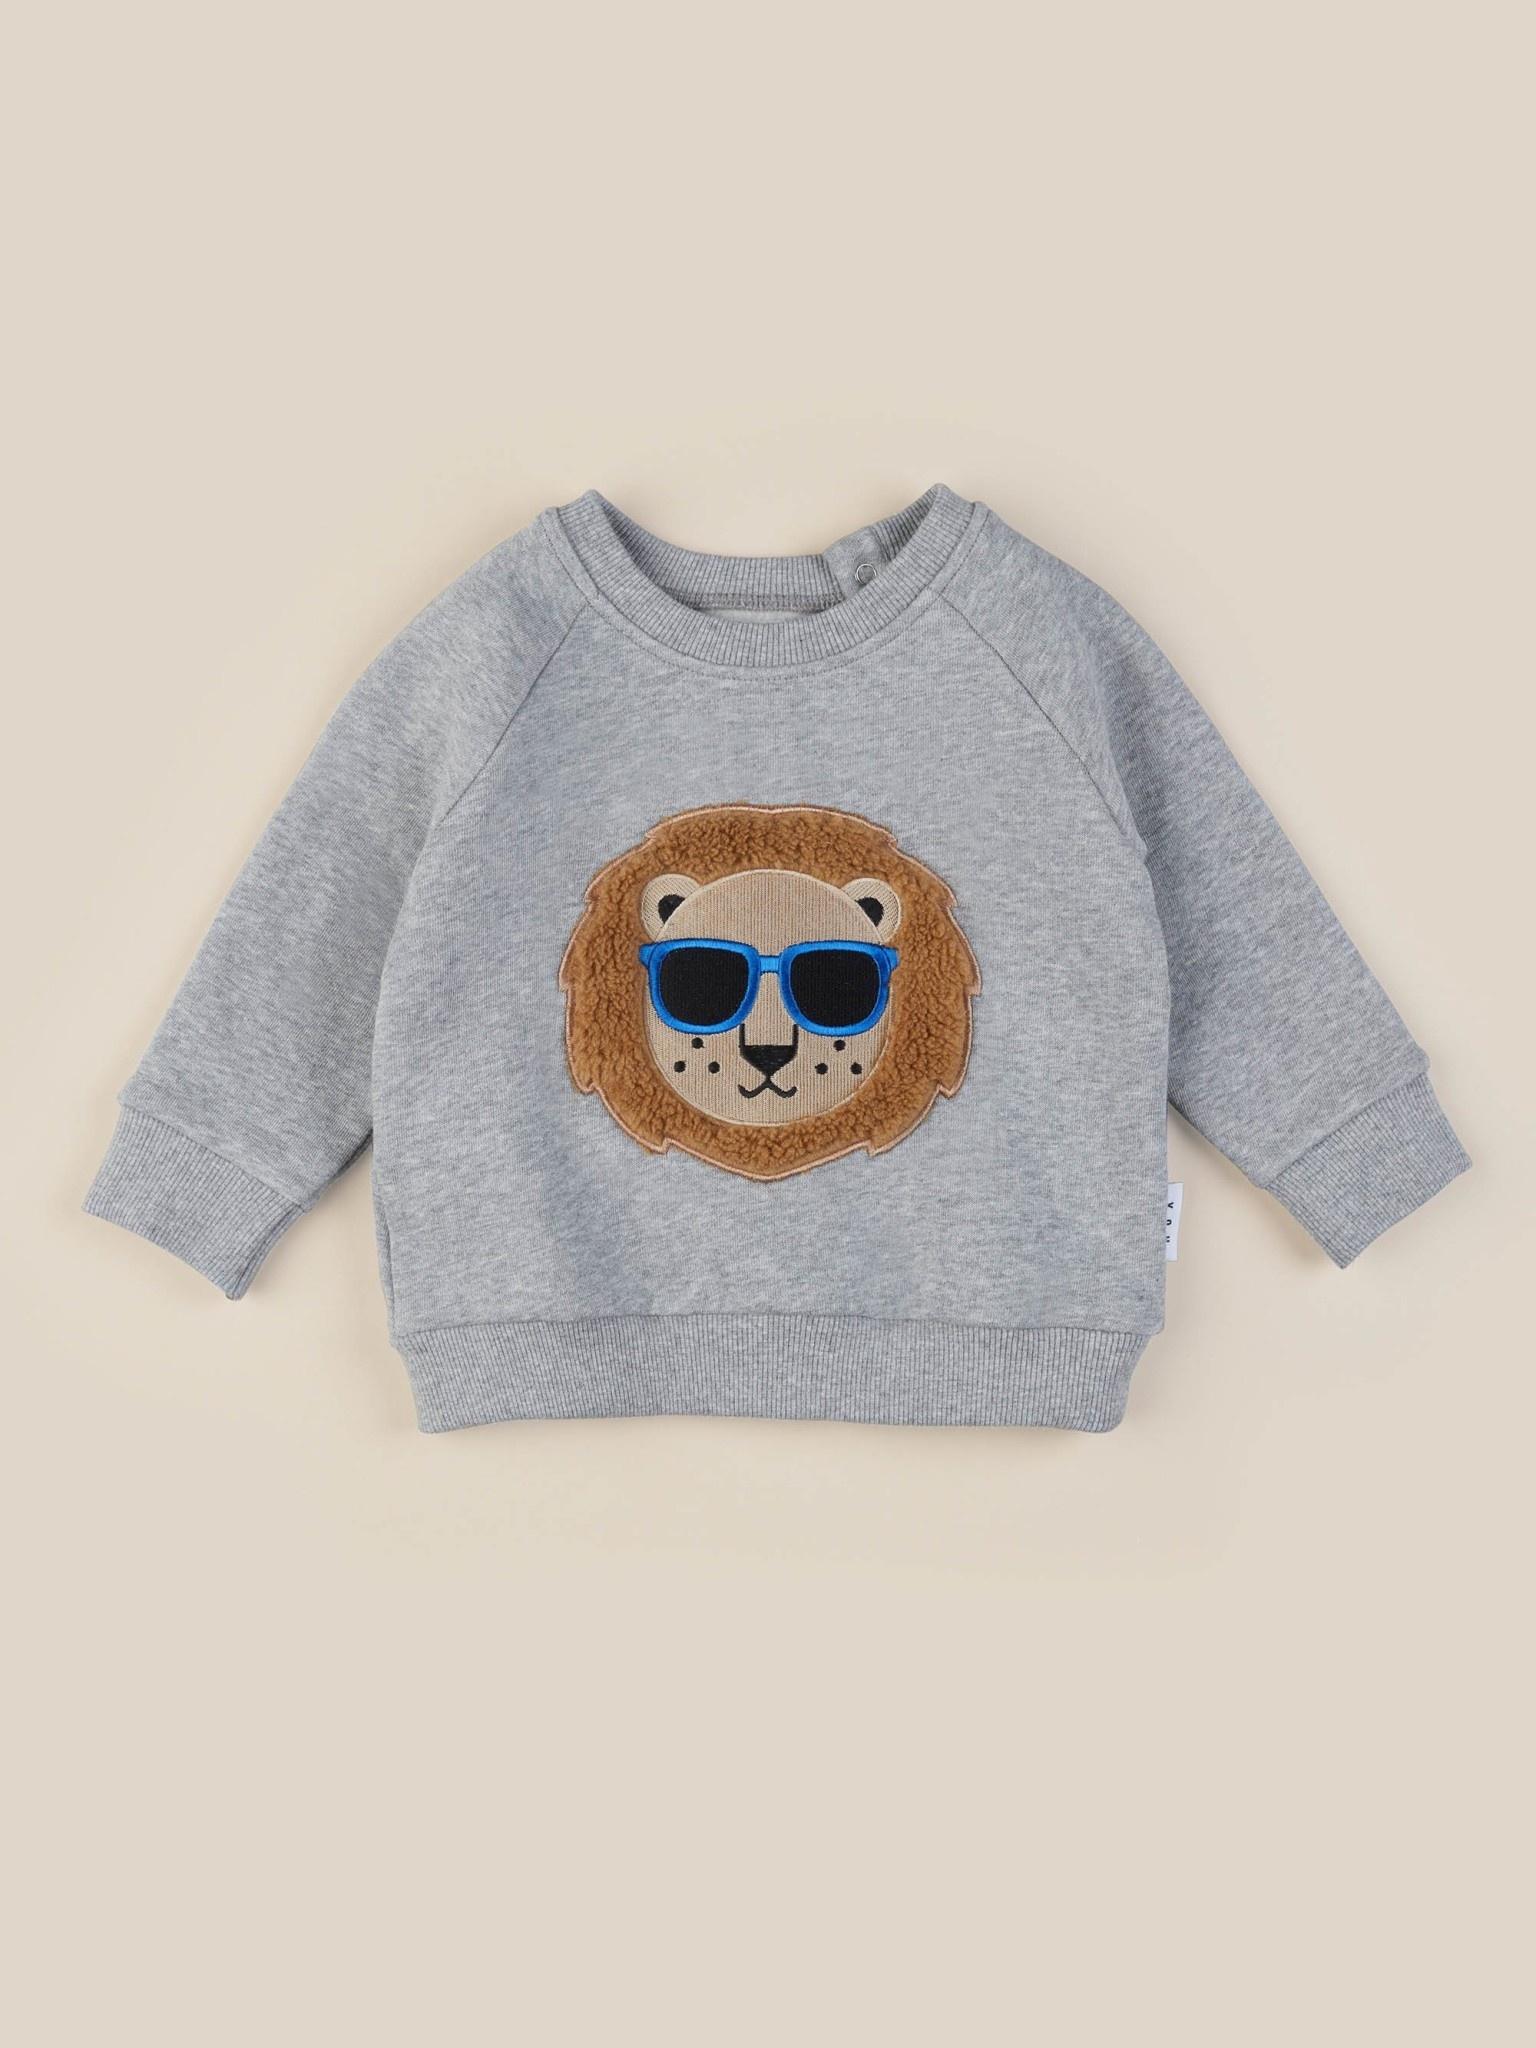 HUX BABY Cool Lion Sweatshirt